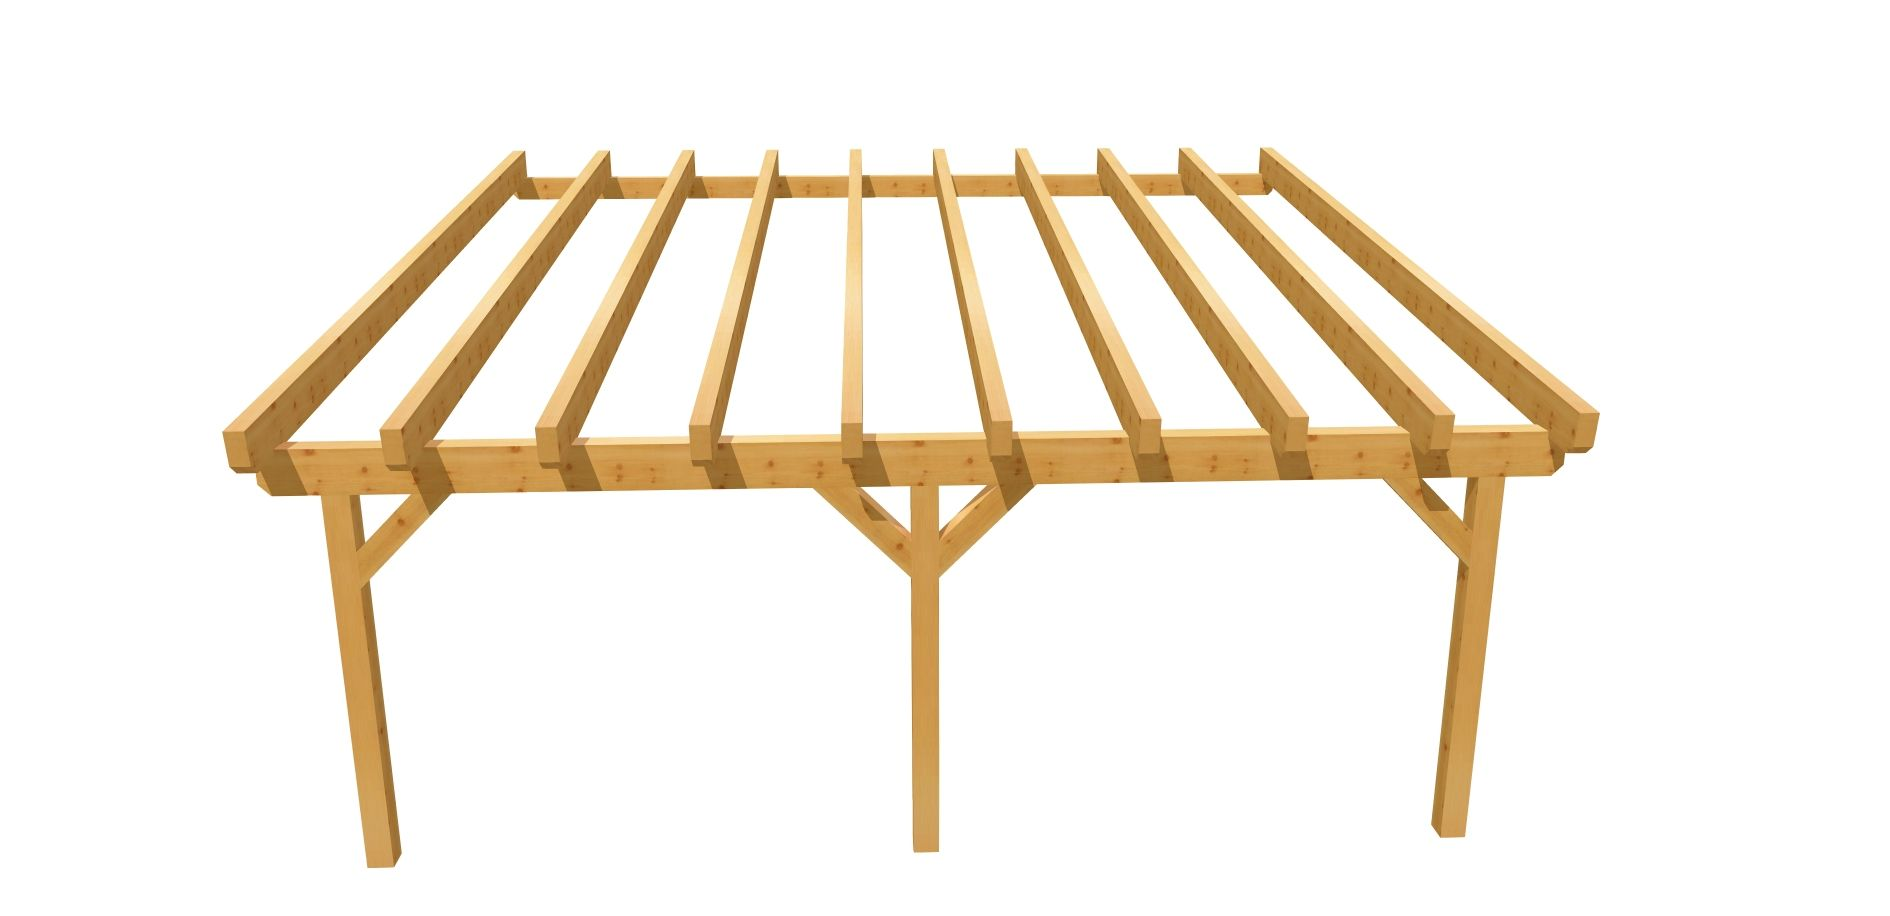 Carport Holz Bauplan 6m X 6m Carport Selber Bauen Holz Bauplan Carport Holz